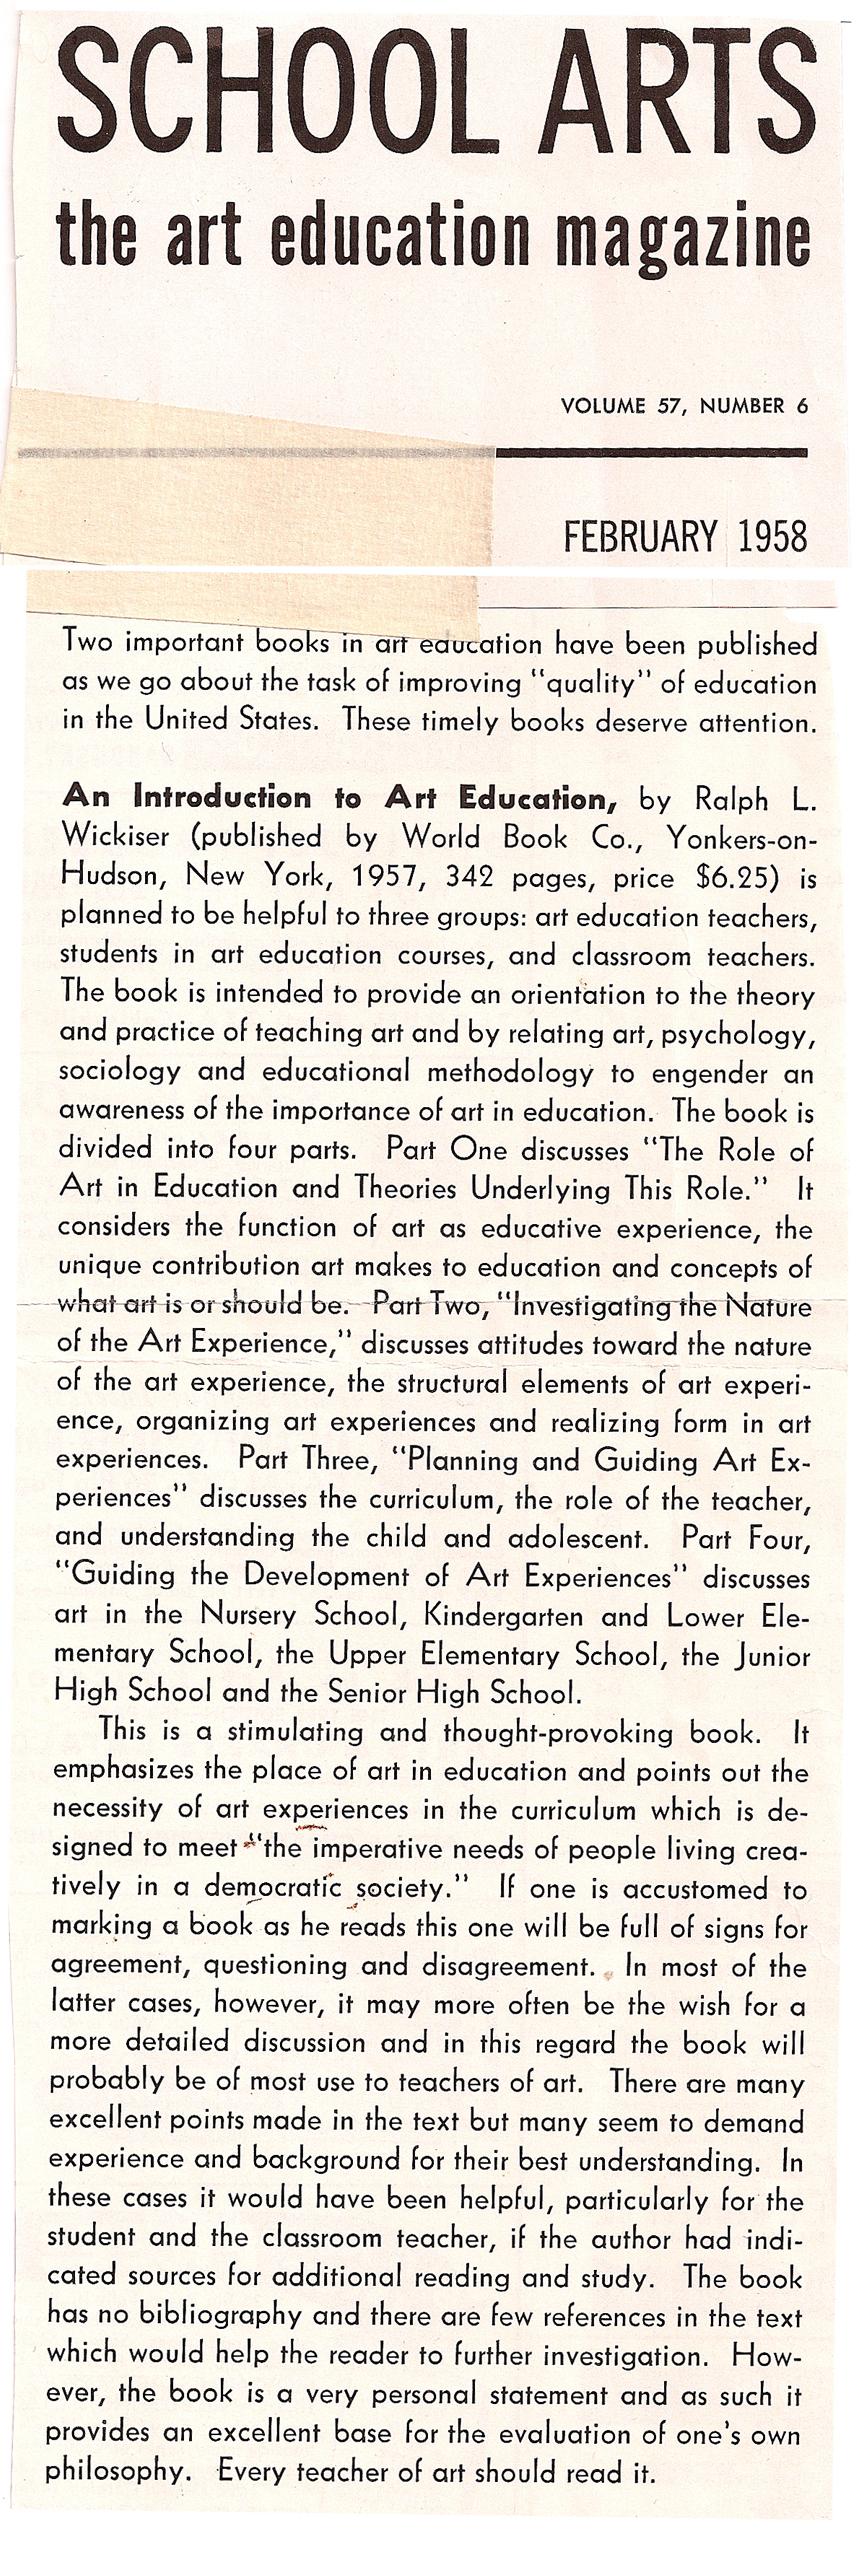 school art 1958.jpg